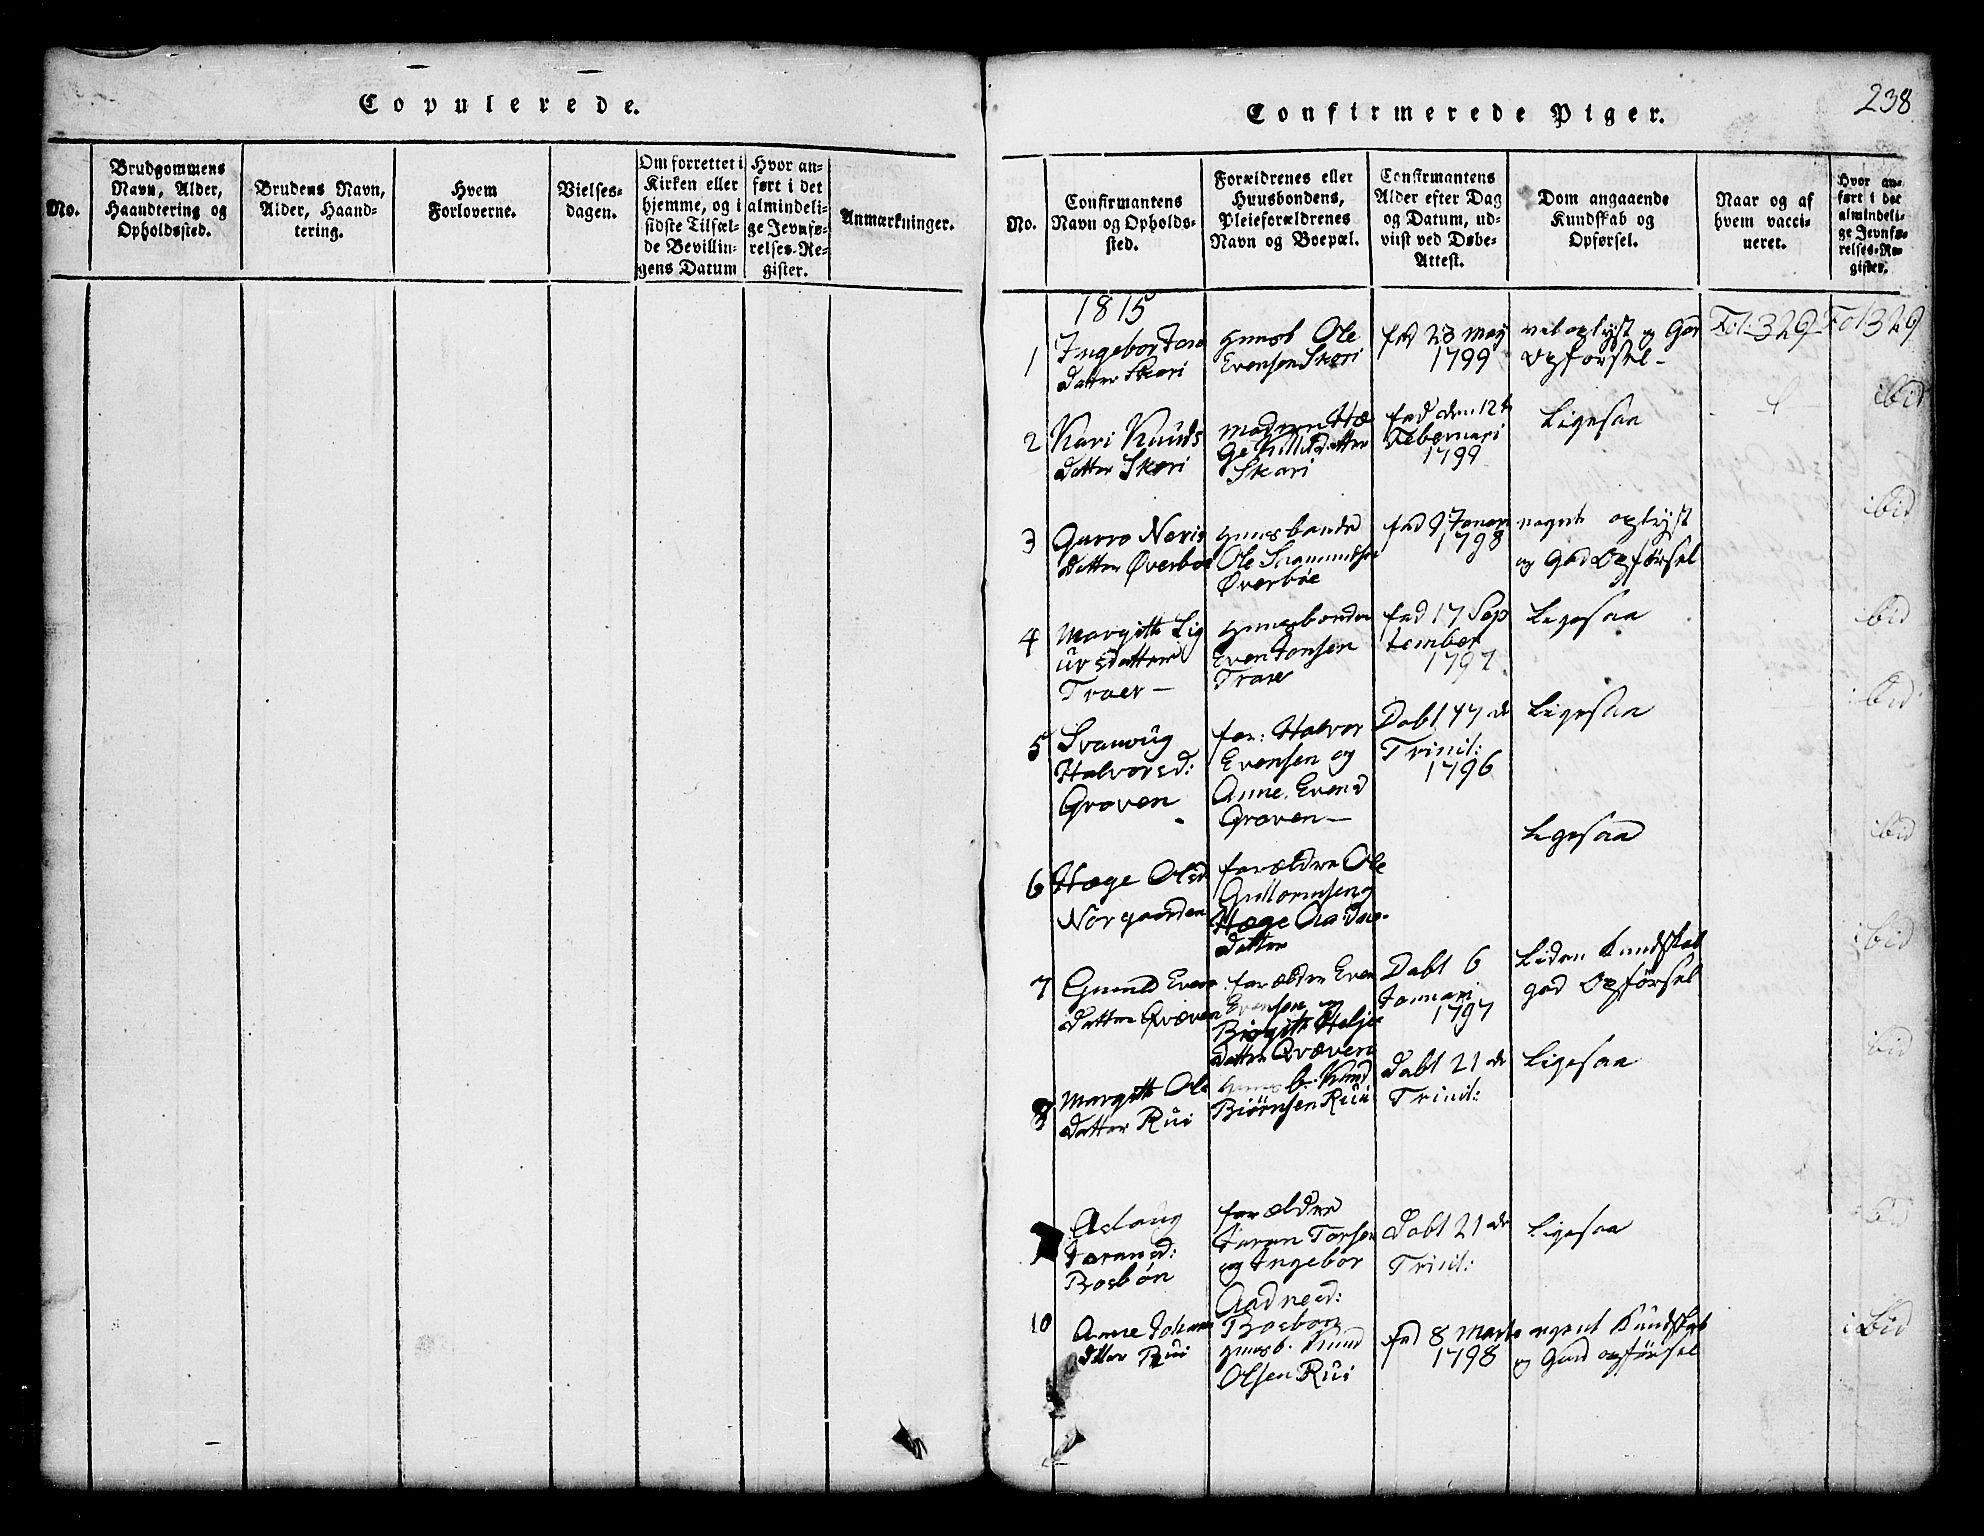 SAKO, Seljord kirkebøker, G/Gc/L0001: Klokkerbok nr. III 1, 1815-1849, s. 238